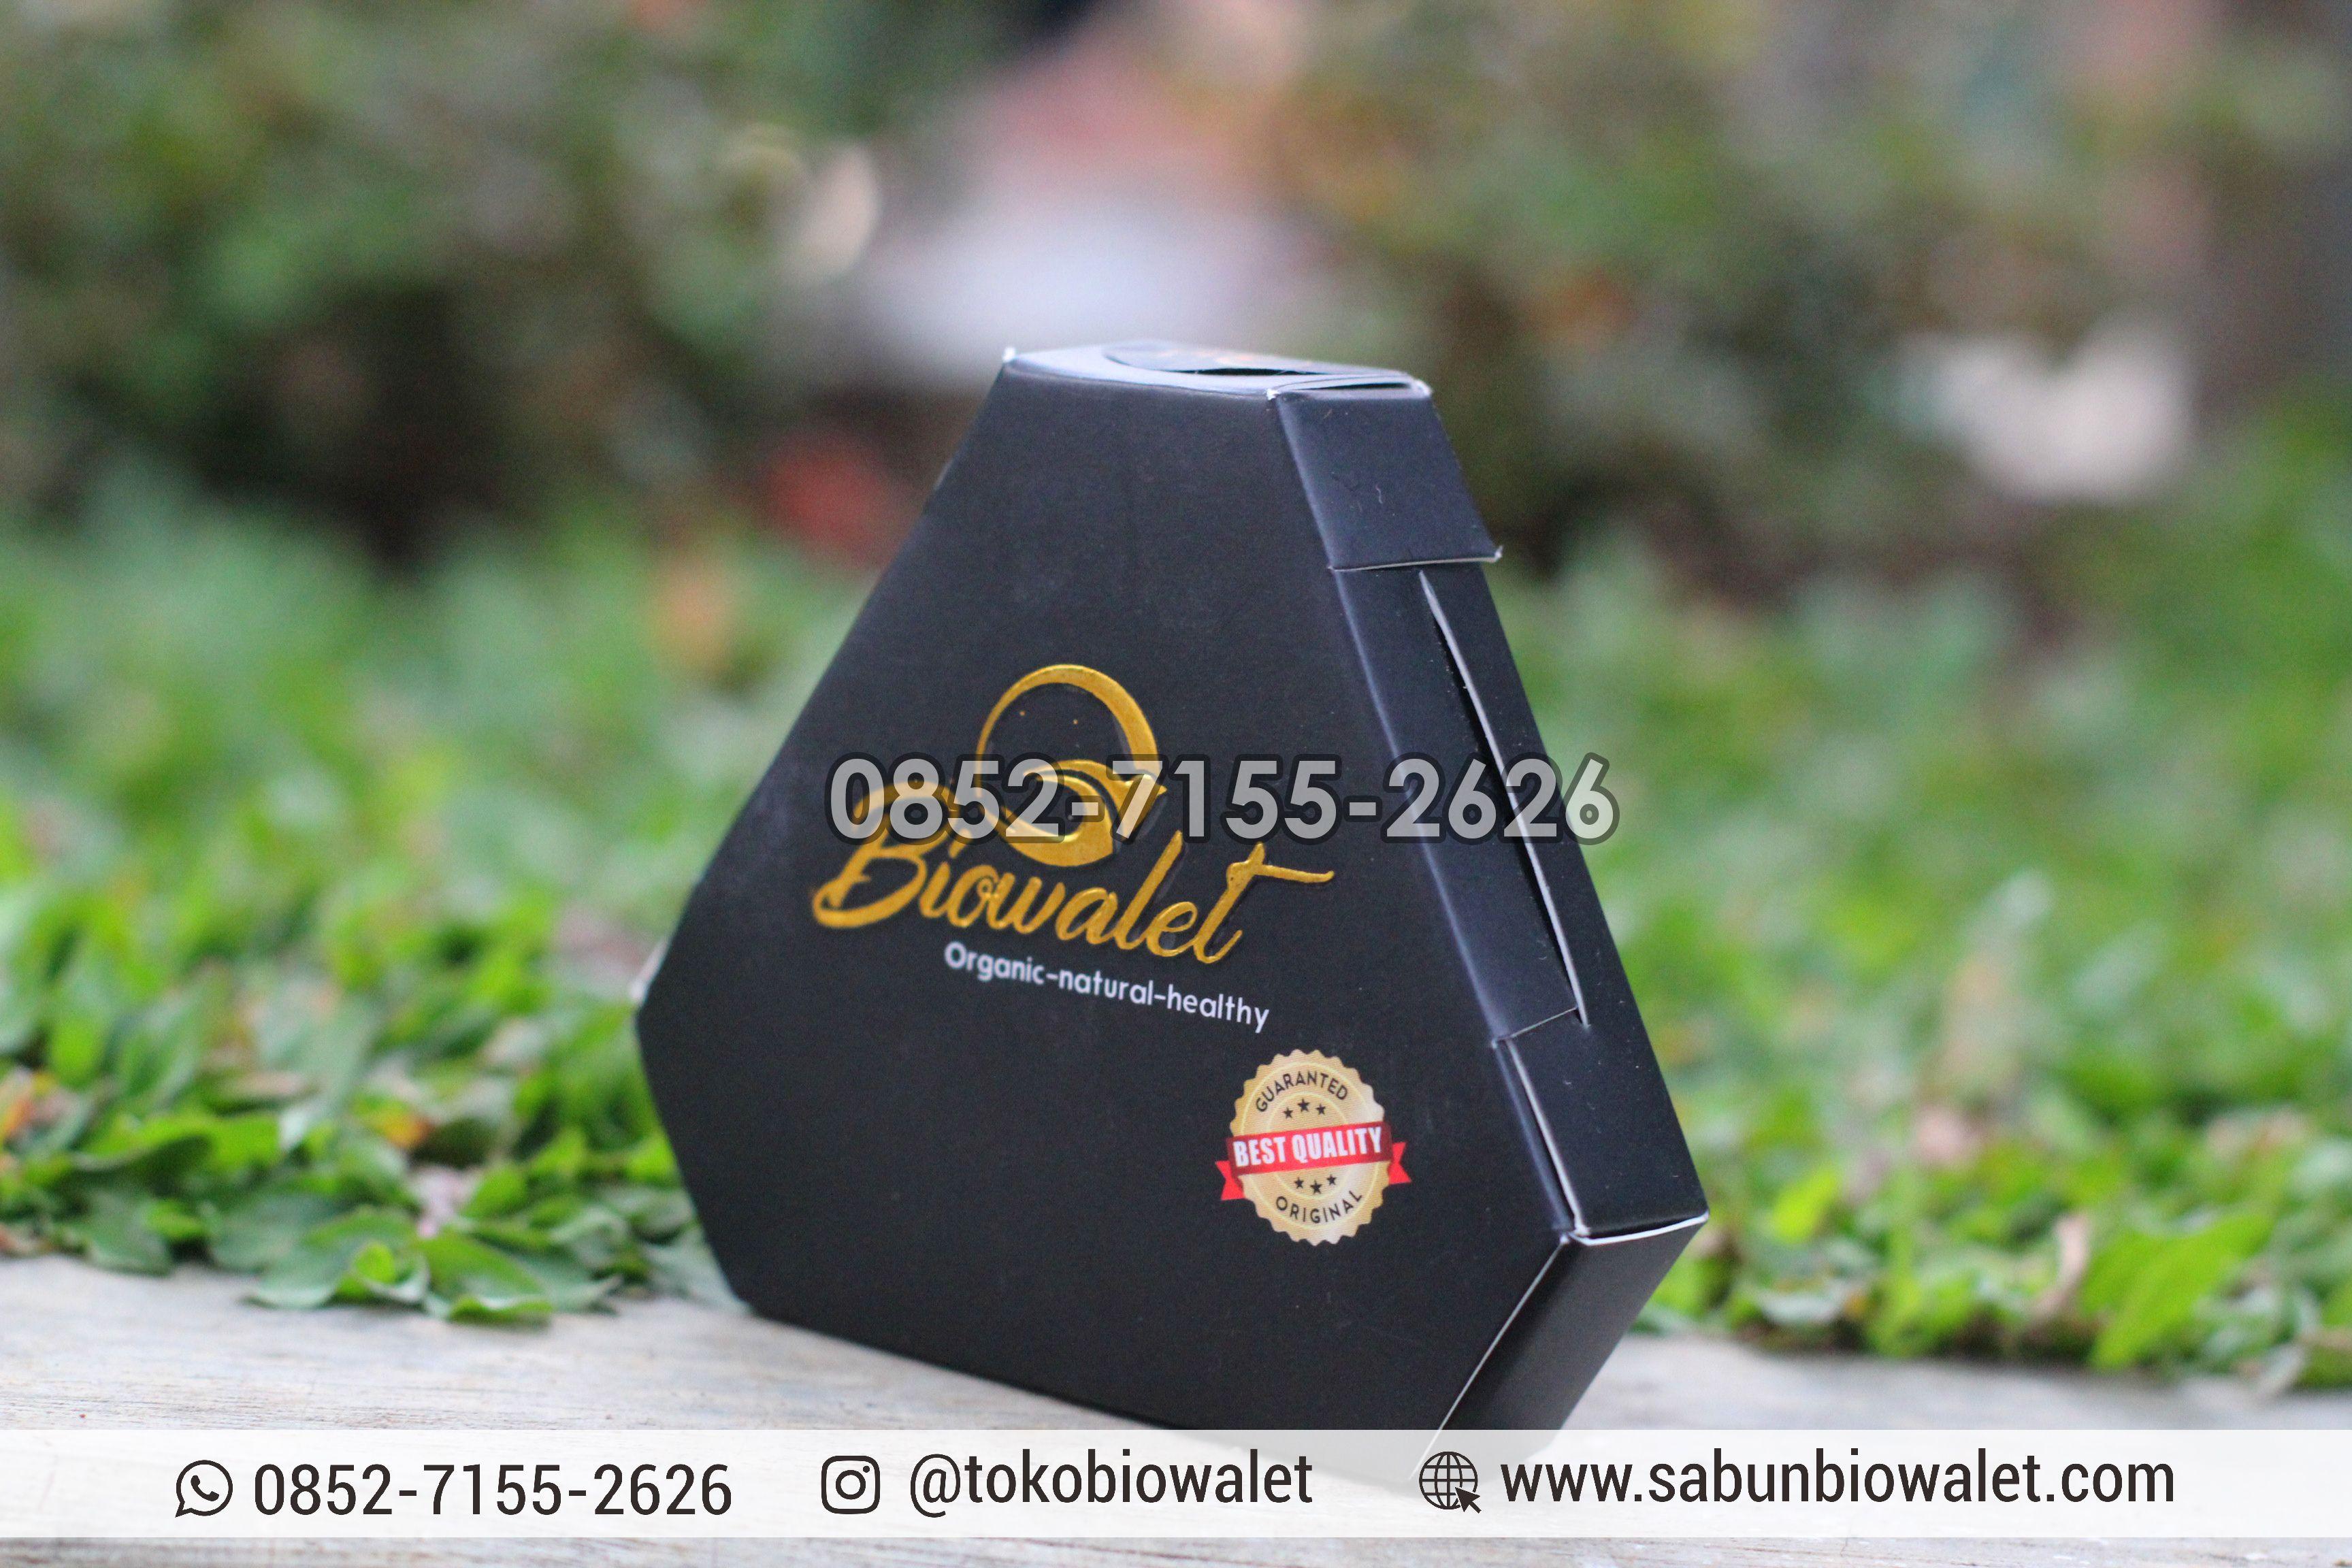 085217552626 Distributor Sabun Muka Untuk Kulit